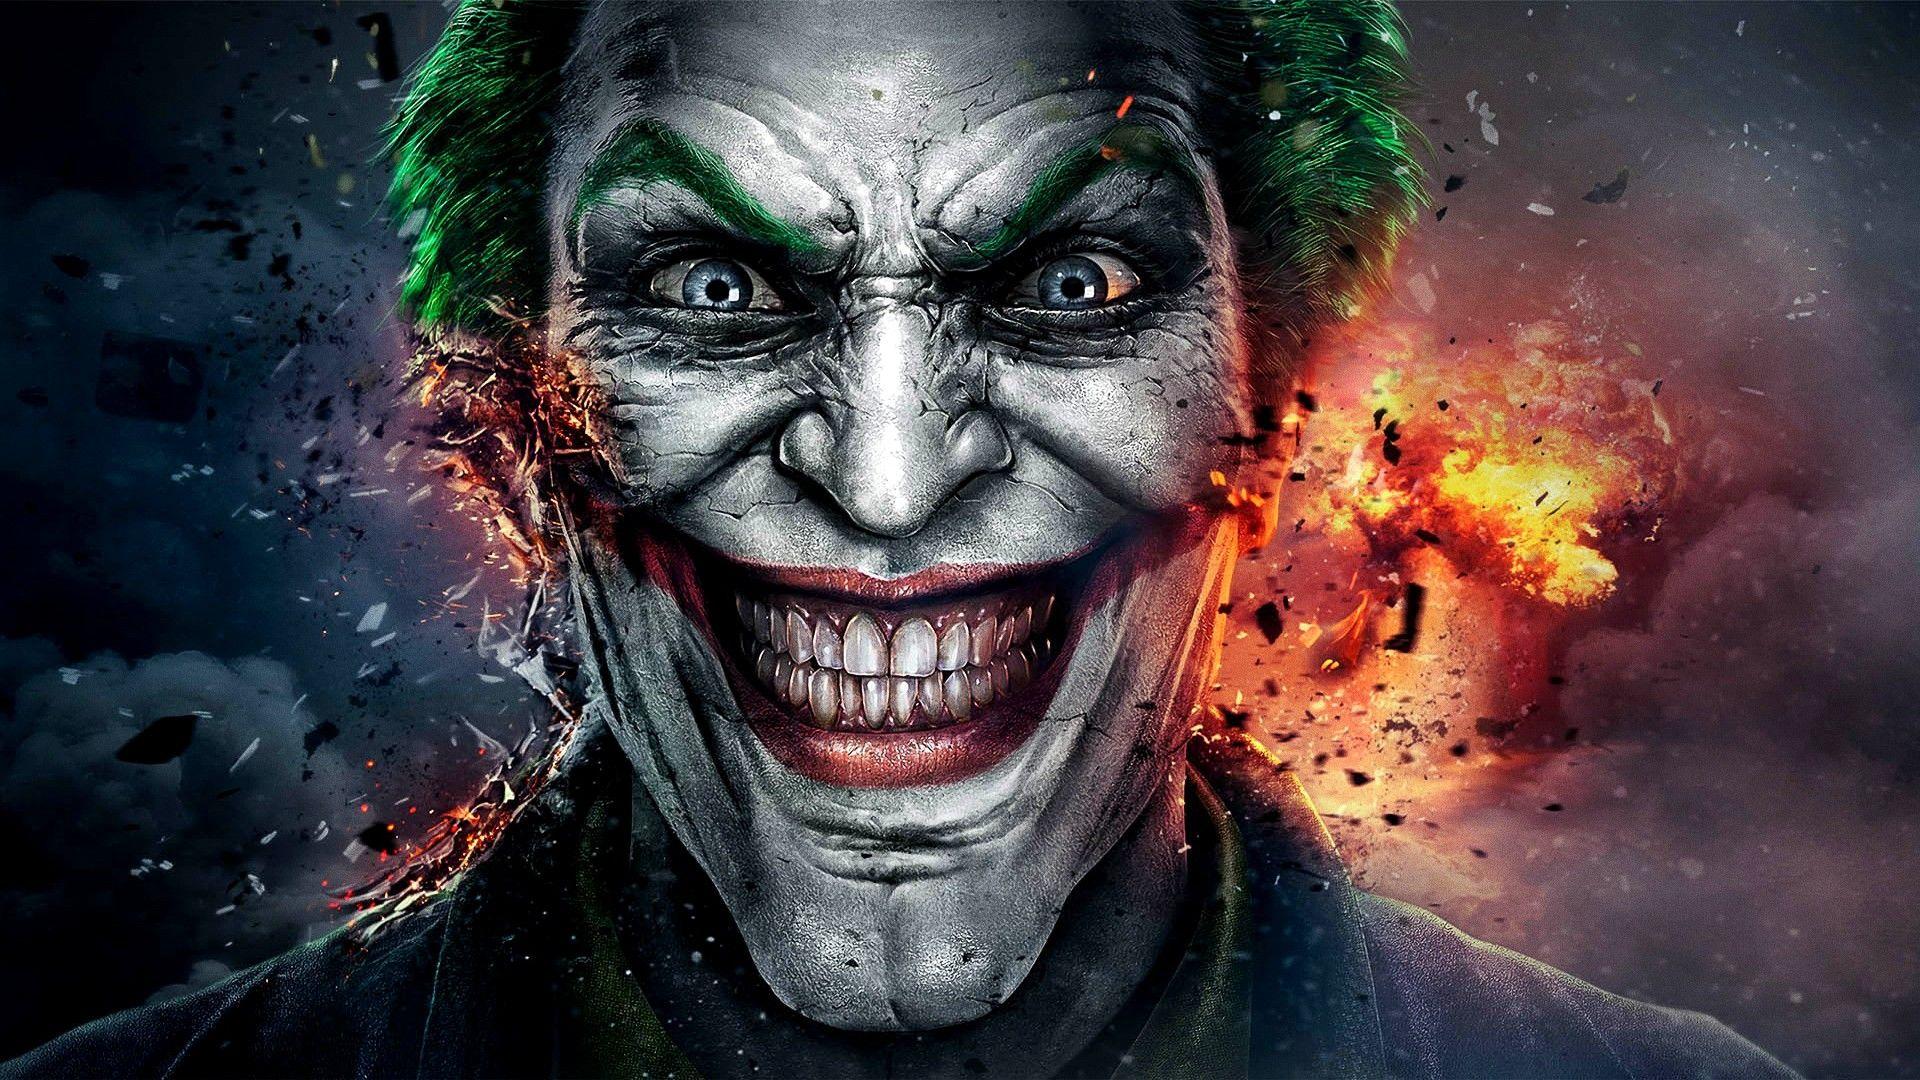 Batman joker cartoon character wallpaper for pc joker for Immagini joker hd